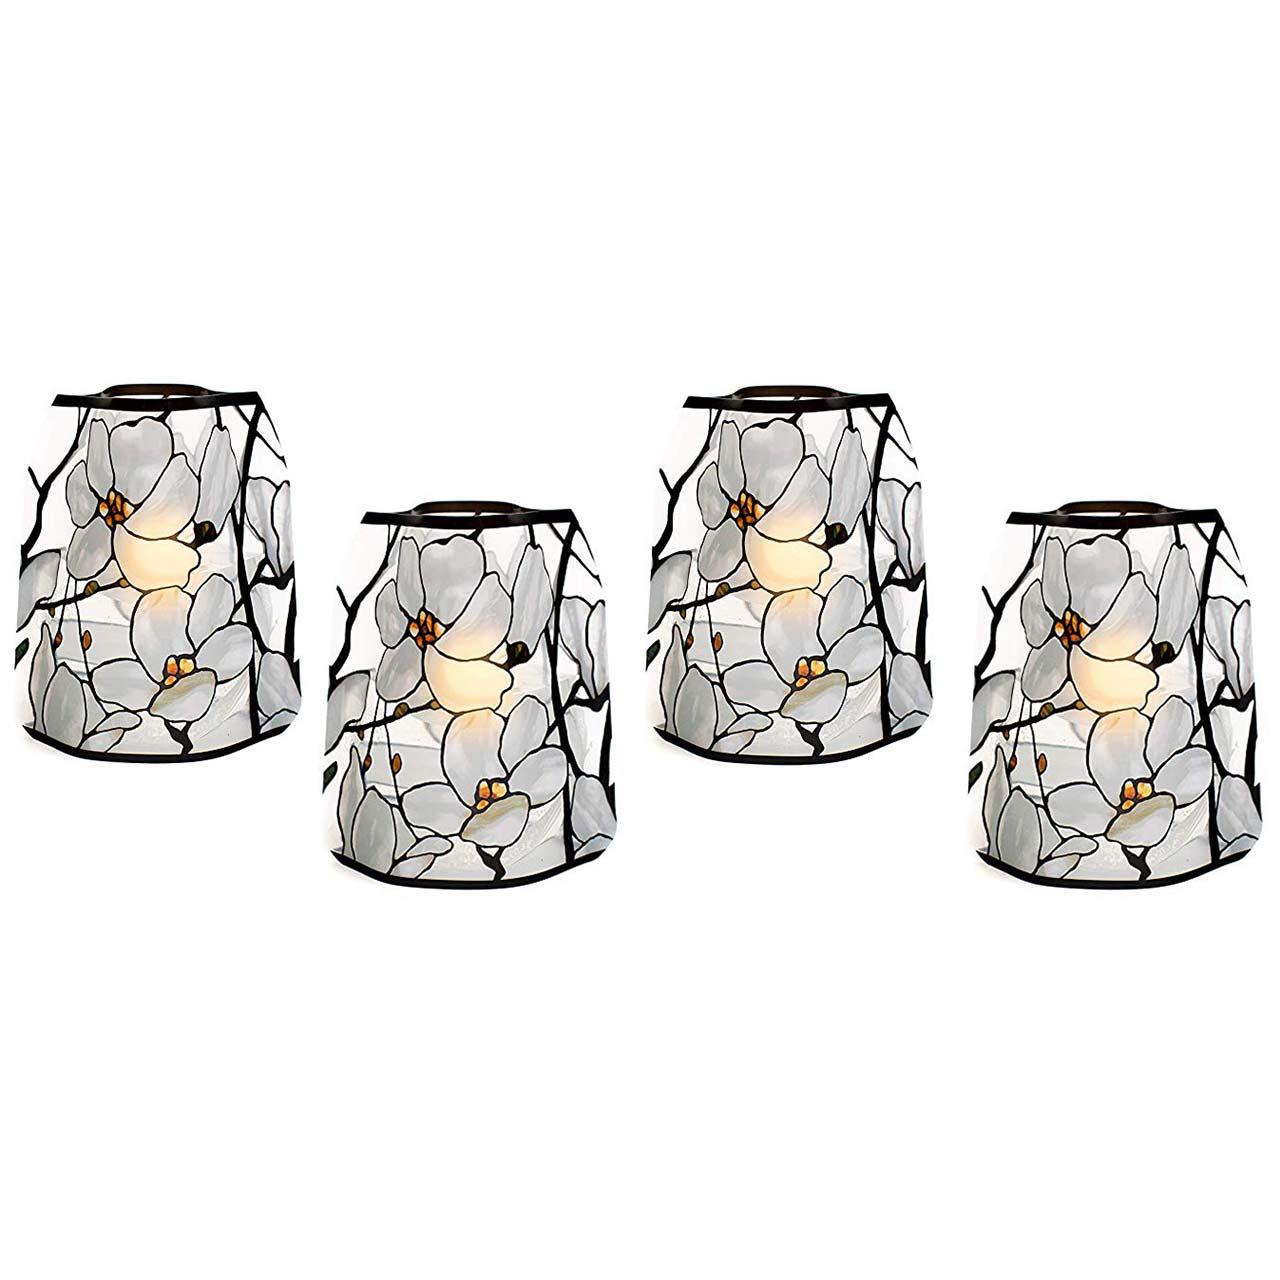 Modgy Tiffany Magnolia Window Luminary Lanterns (set of 4) | the design gift shop